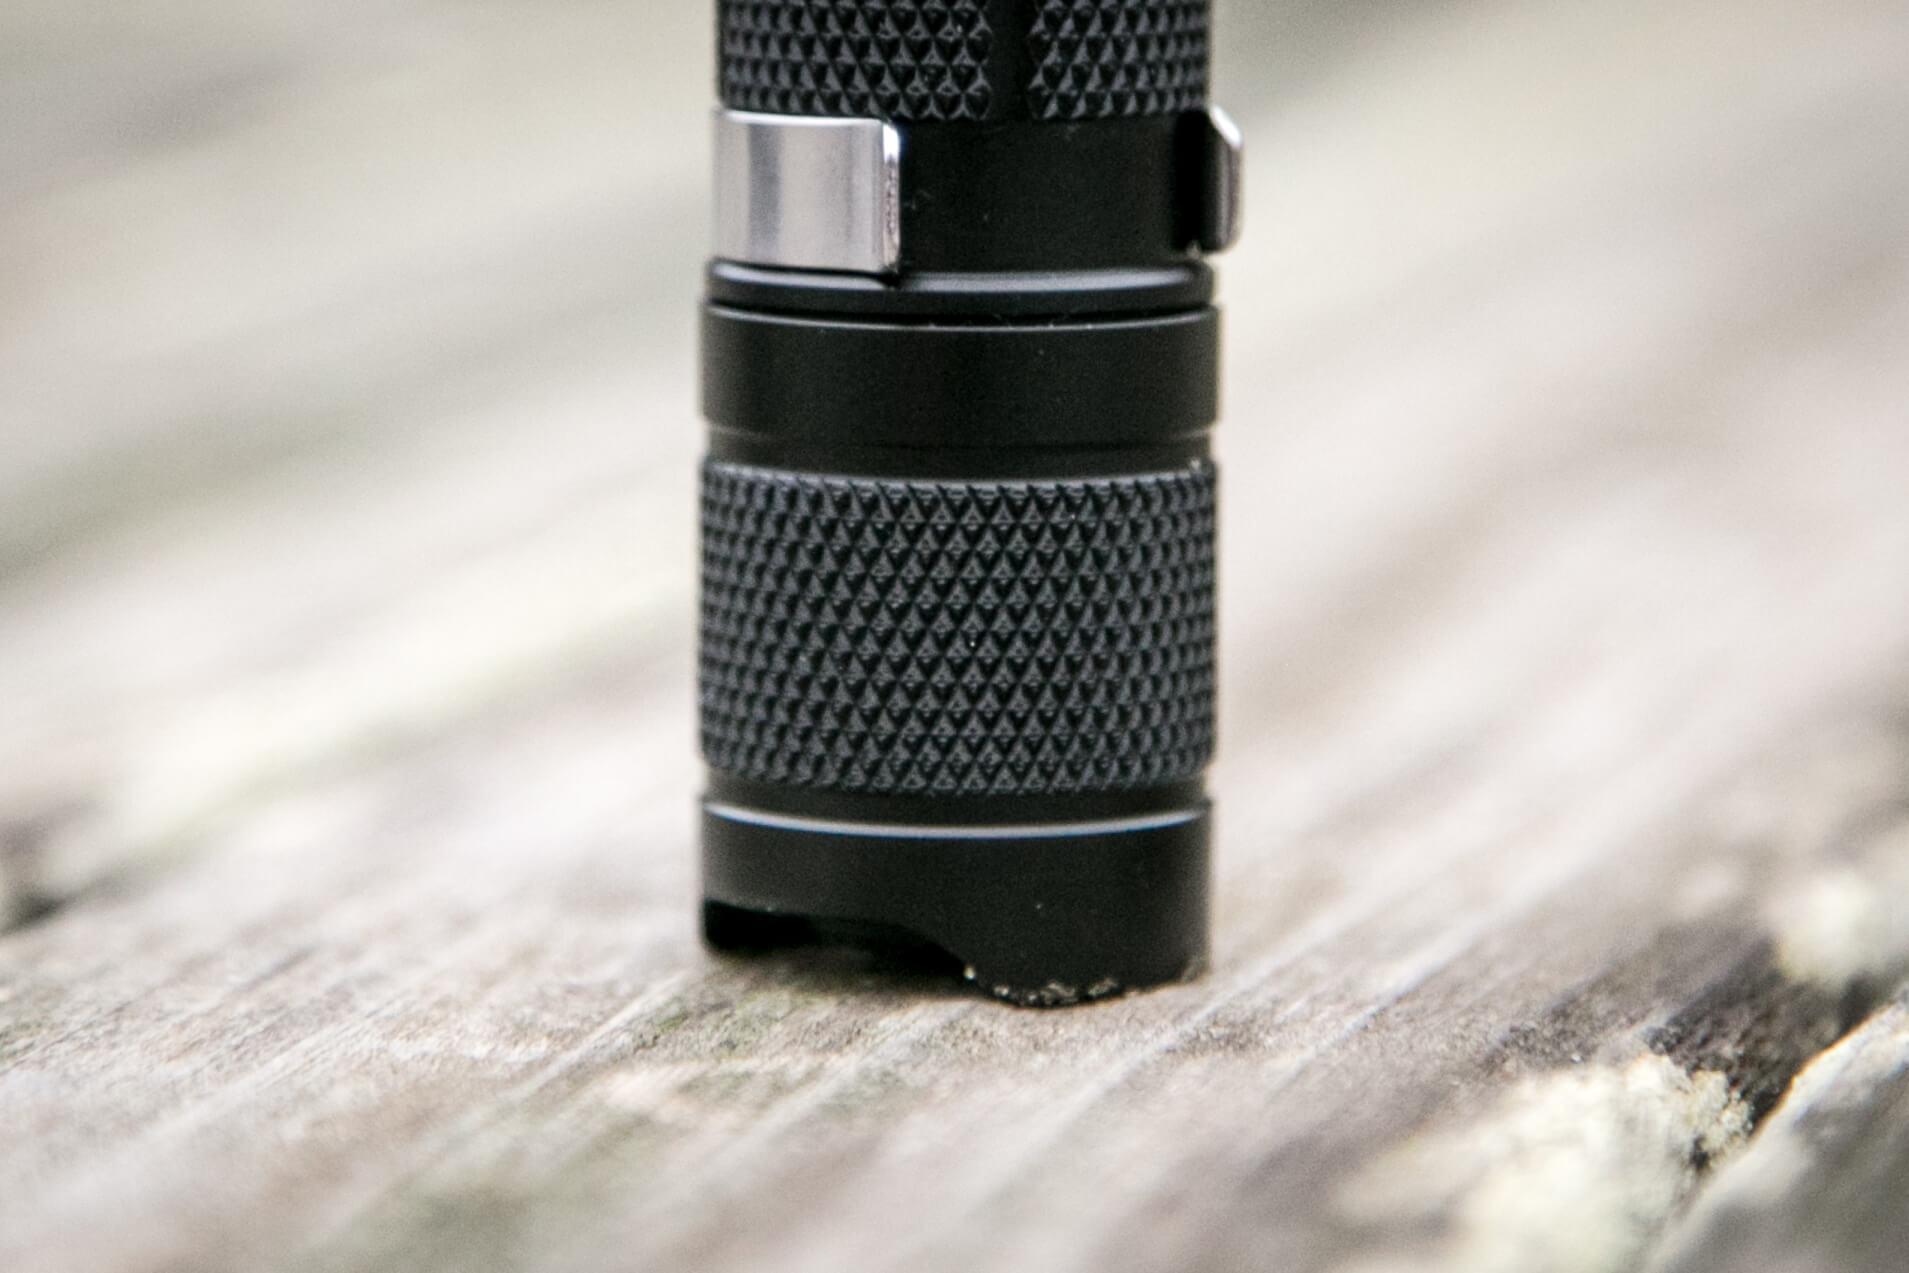 sofirn sp31uv ultraviolet 18650 flashlight tailcap knurling